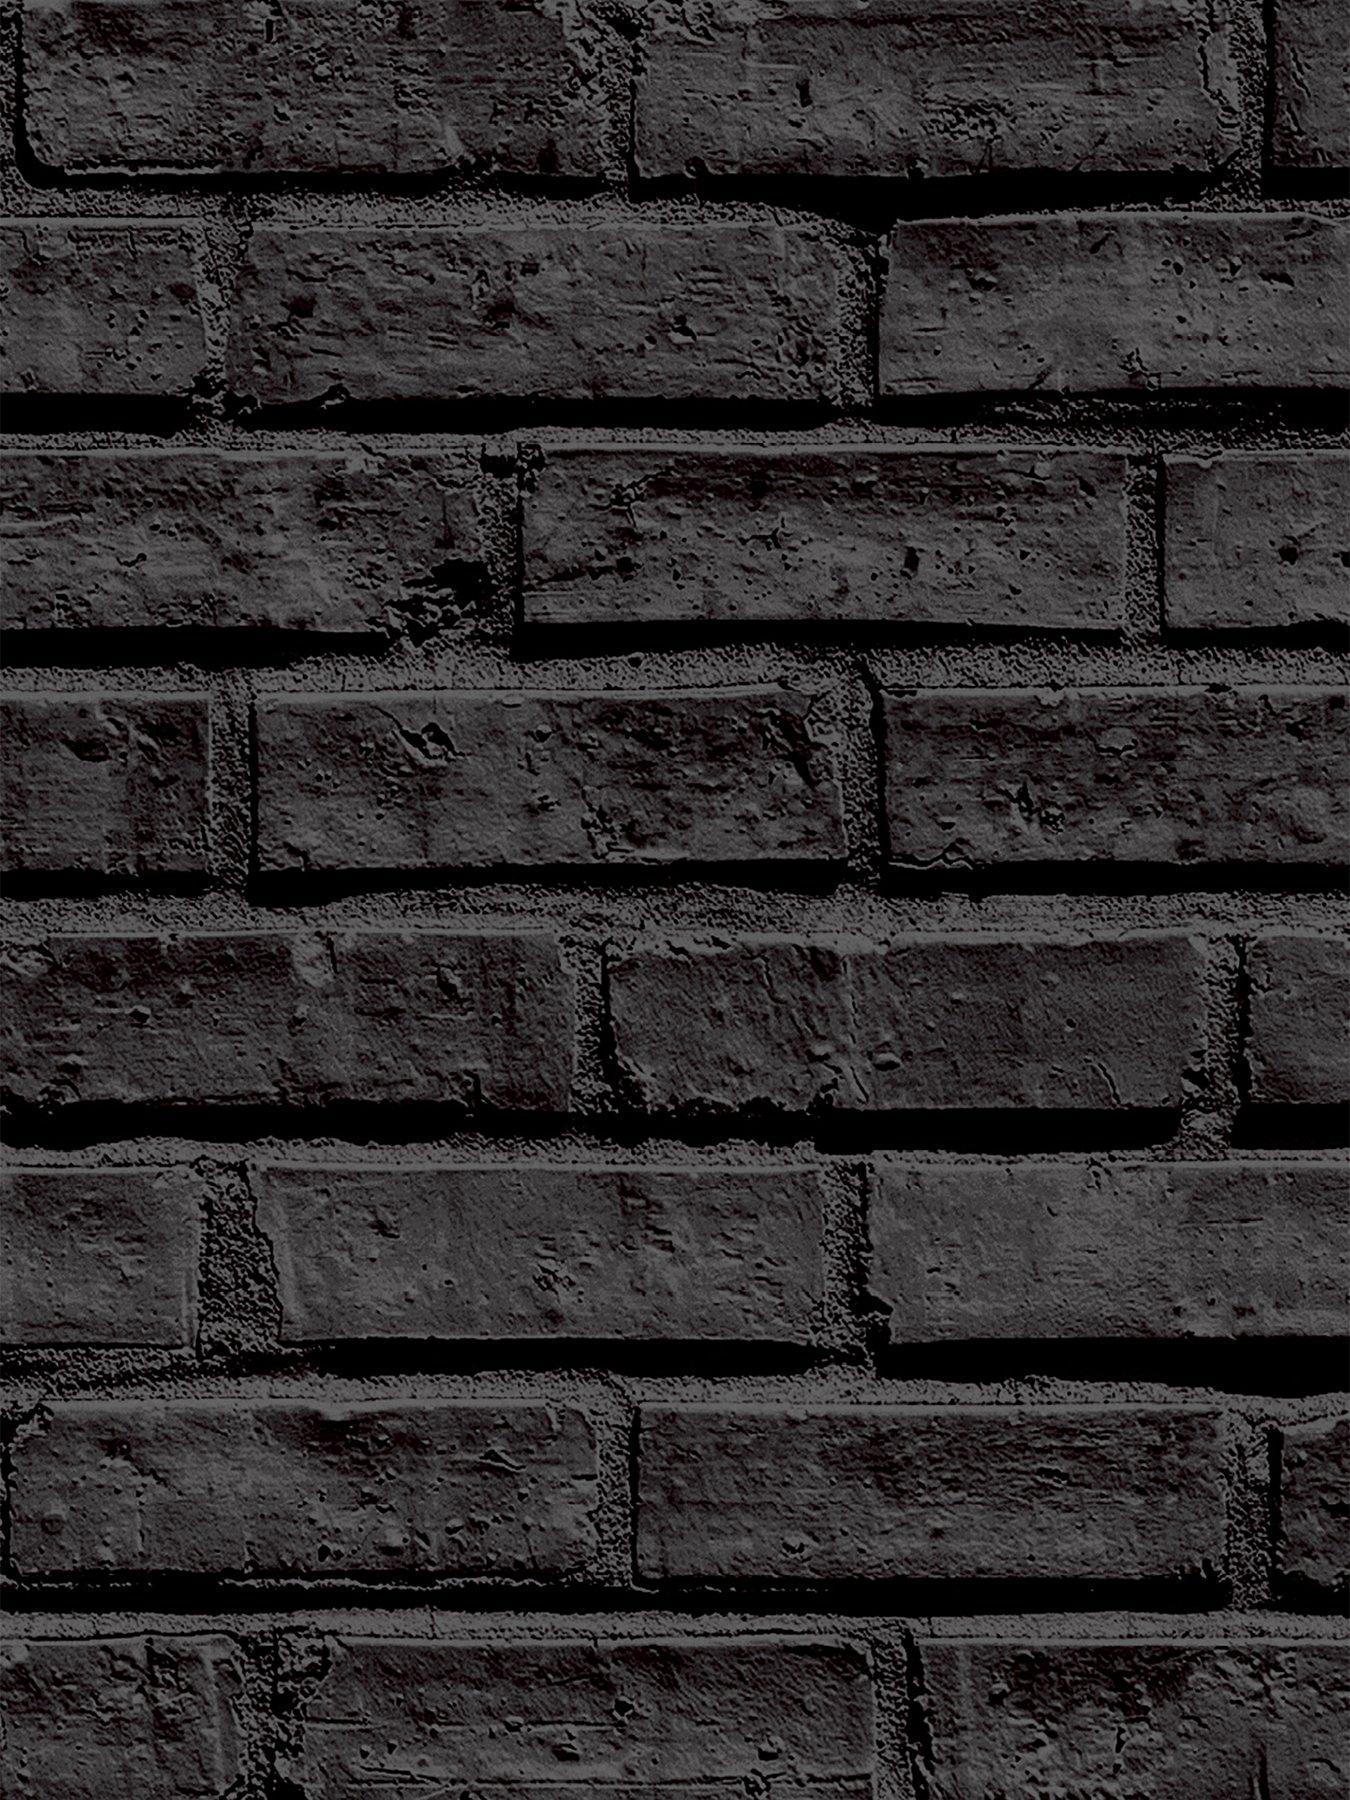 Download 1000 Wallpaper Black HD